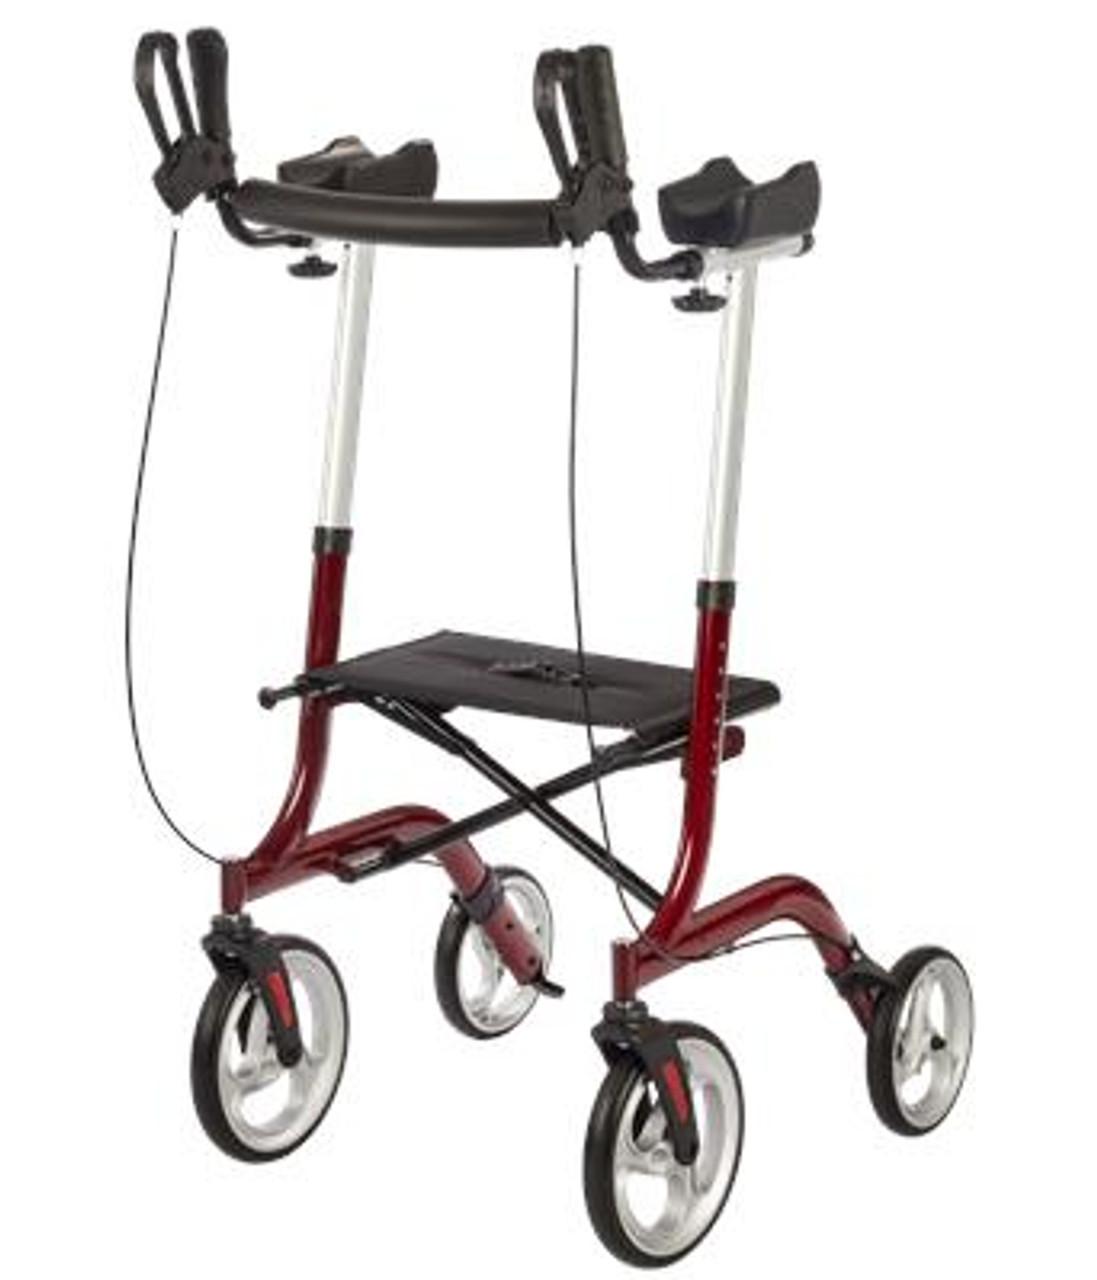 Venture XP - Upright Posture Euro Style Rollator